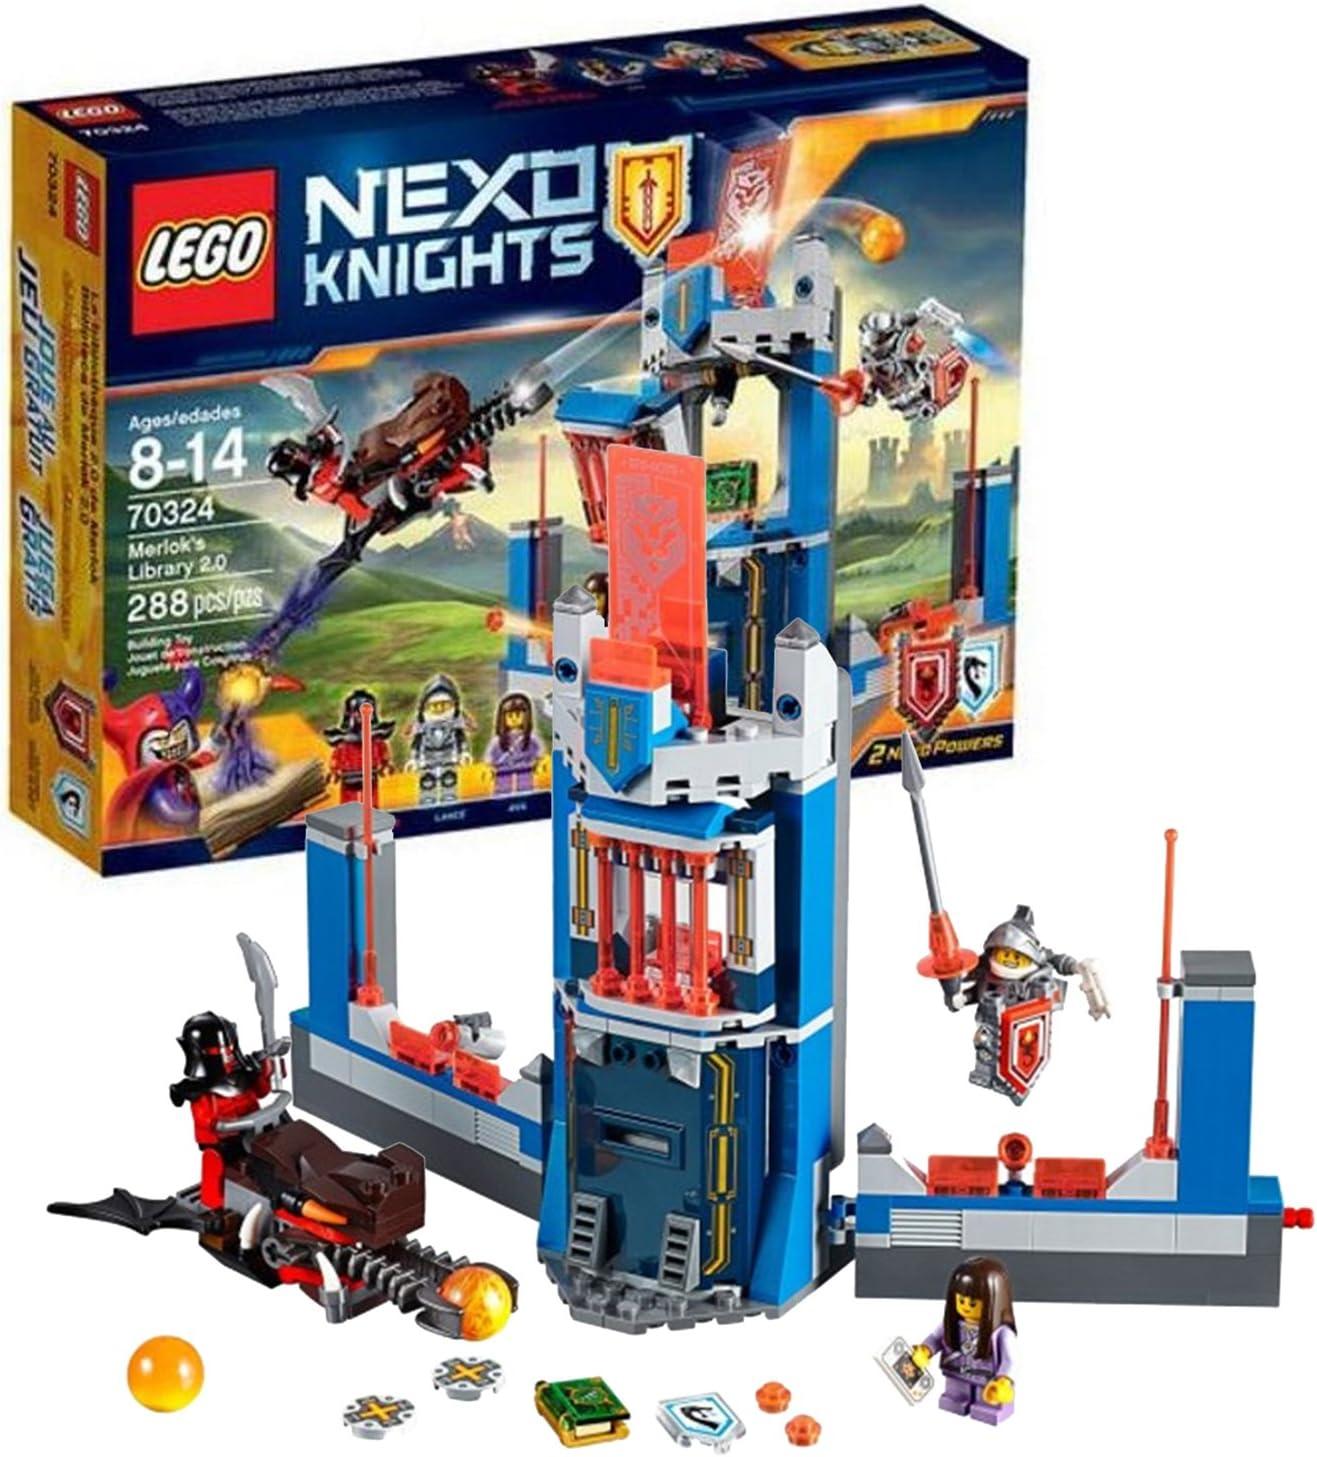 Lego nexo knights minifigurine-flama-lot kg nex054 new